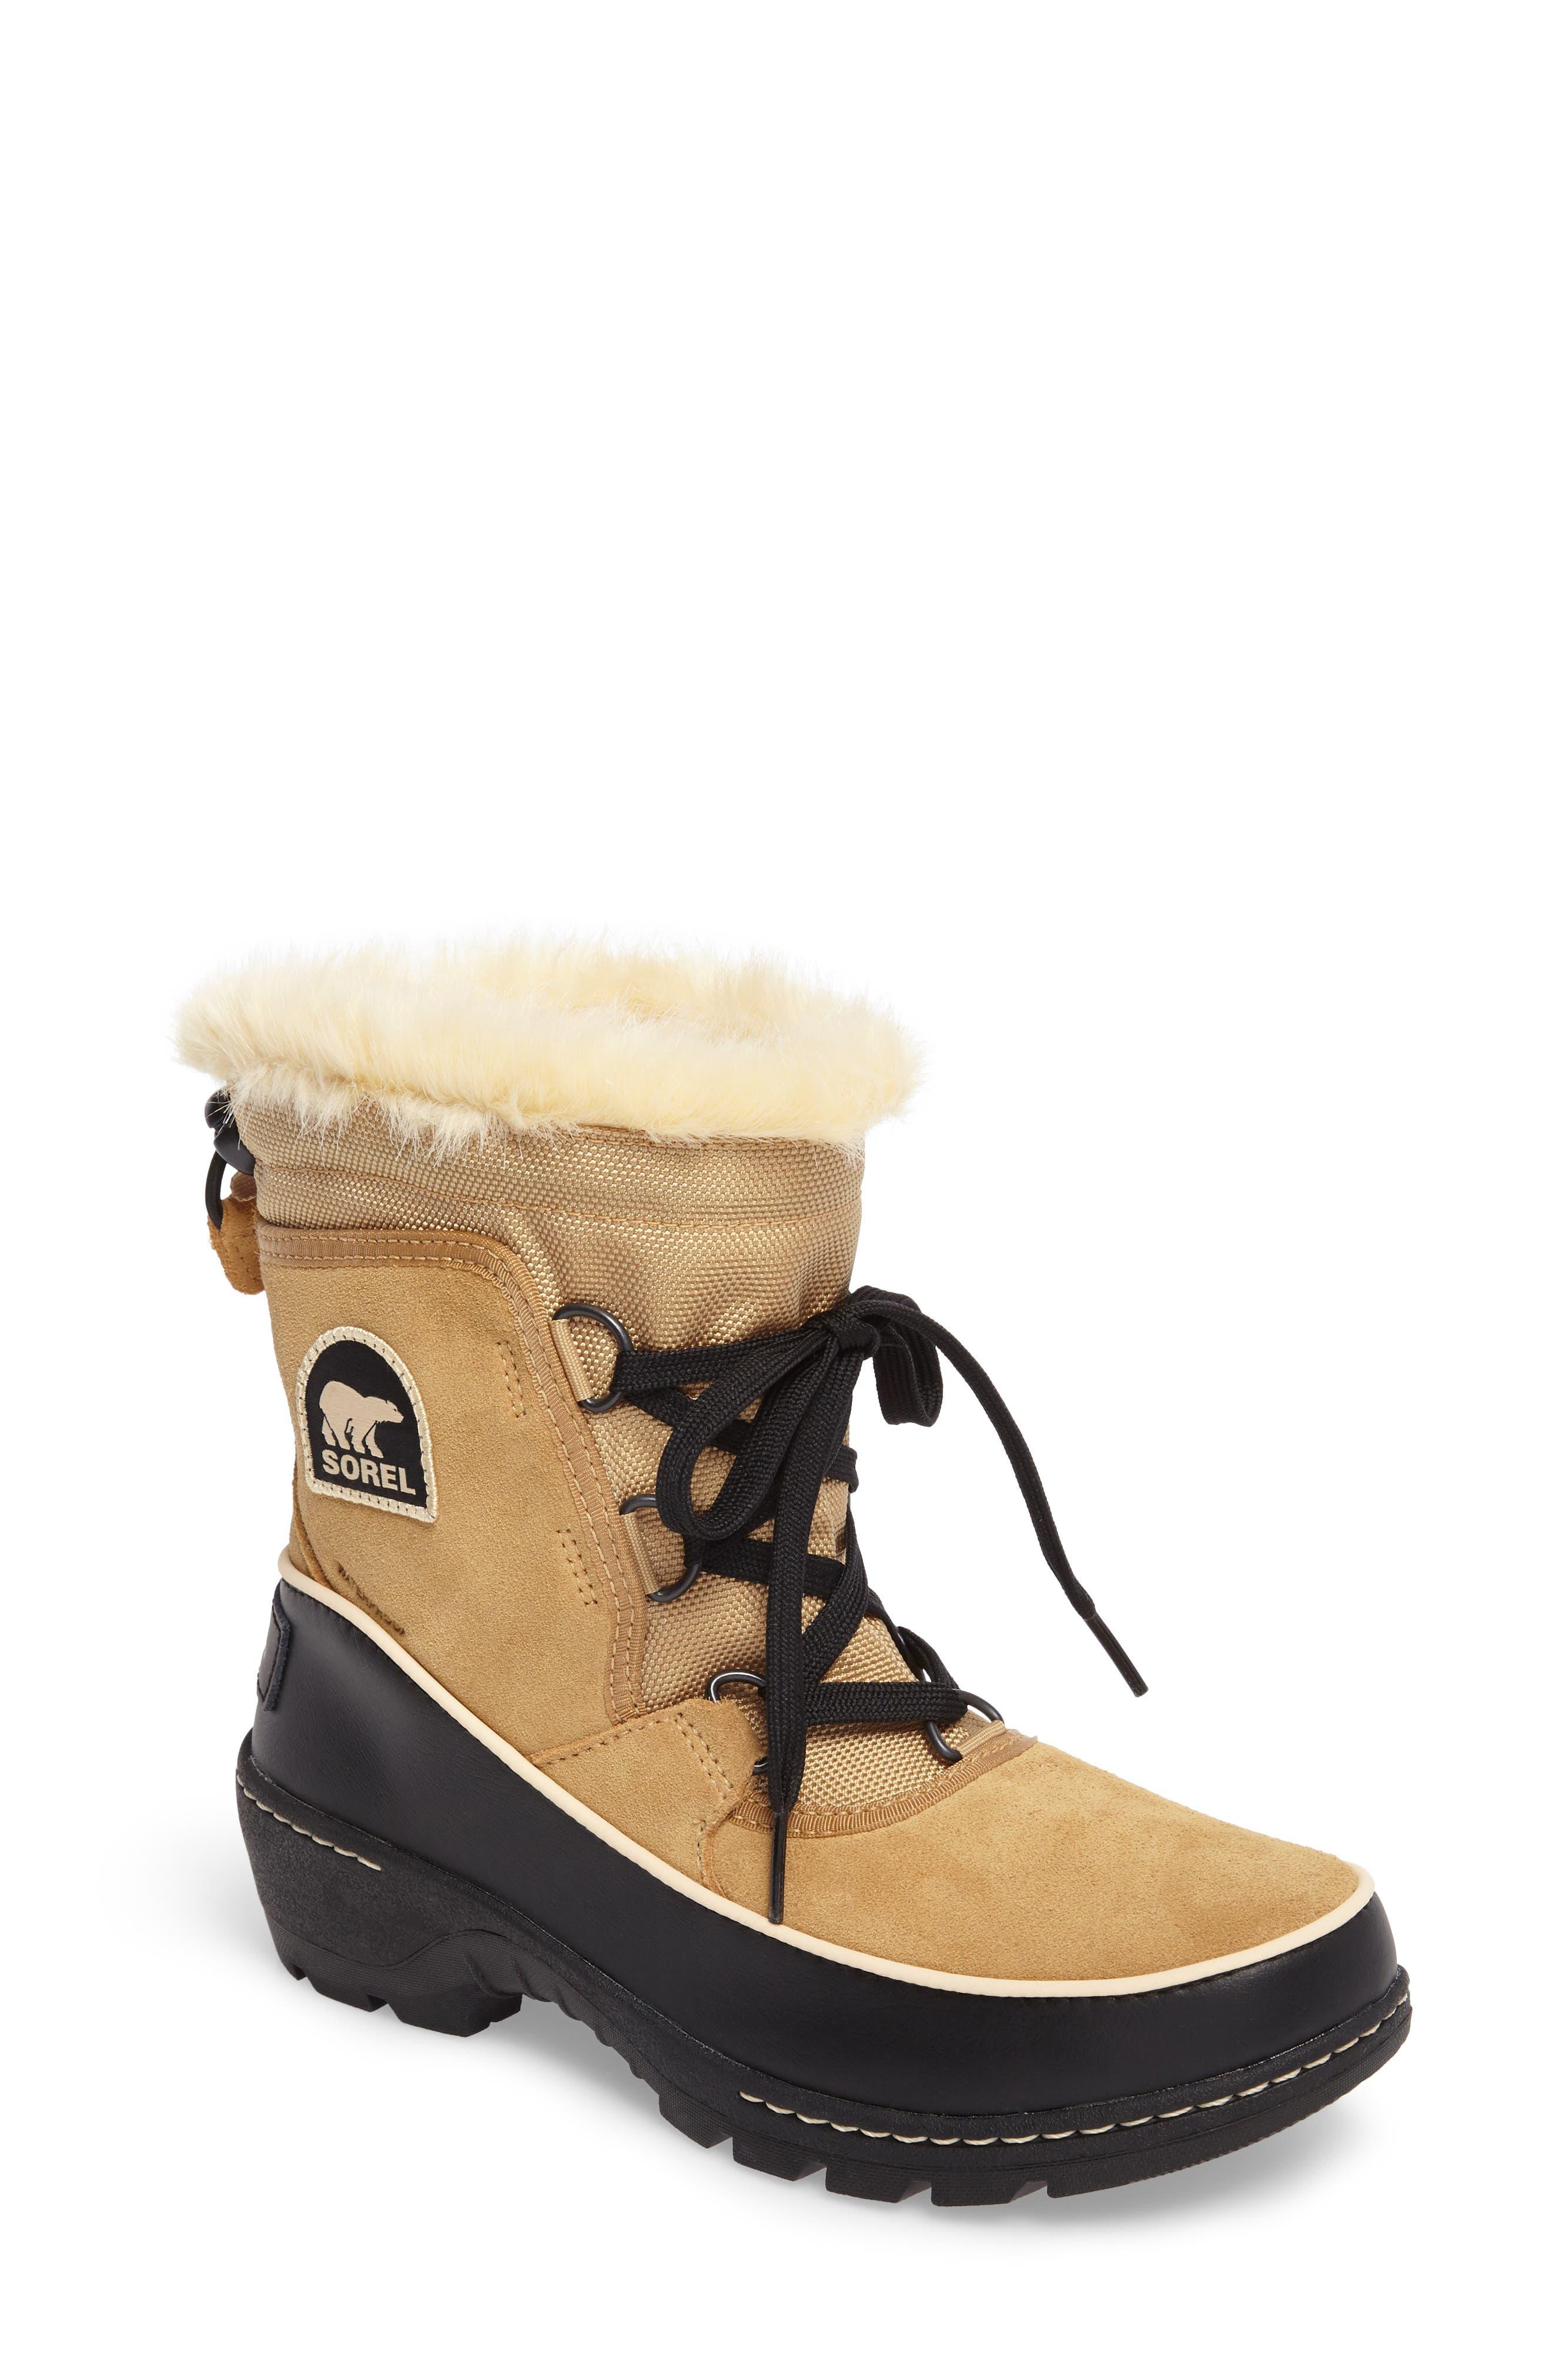 Tivoli III Waterproof Boot,                         Main,                         color, Curry/ Black